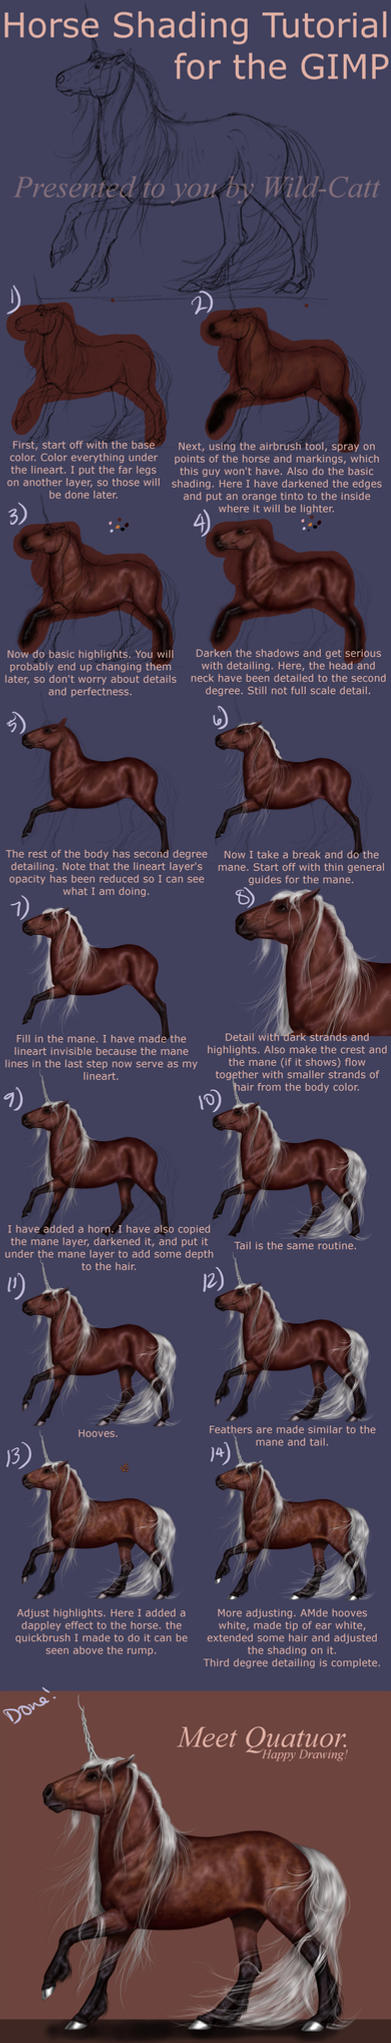 Horse Shading Tutorial V3 GIMP by Vizseryn